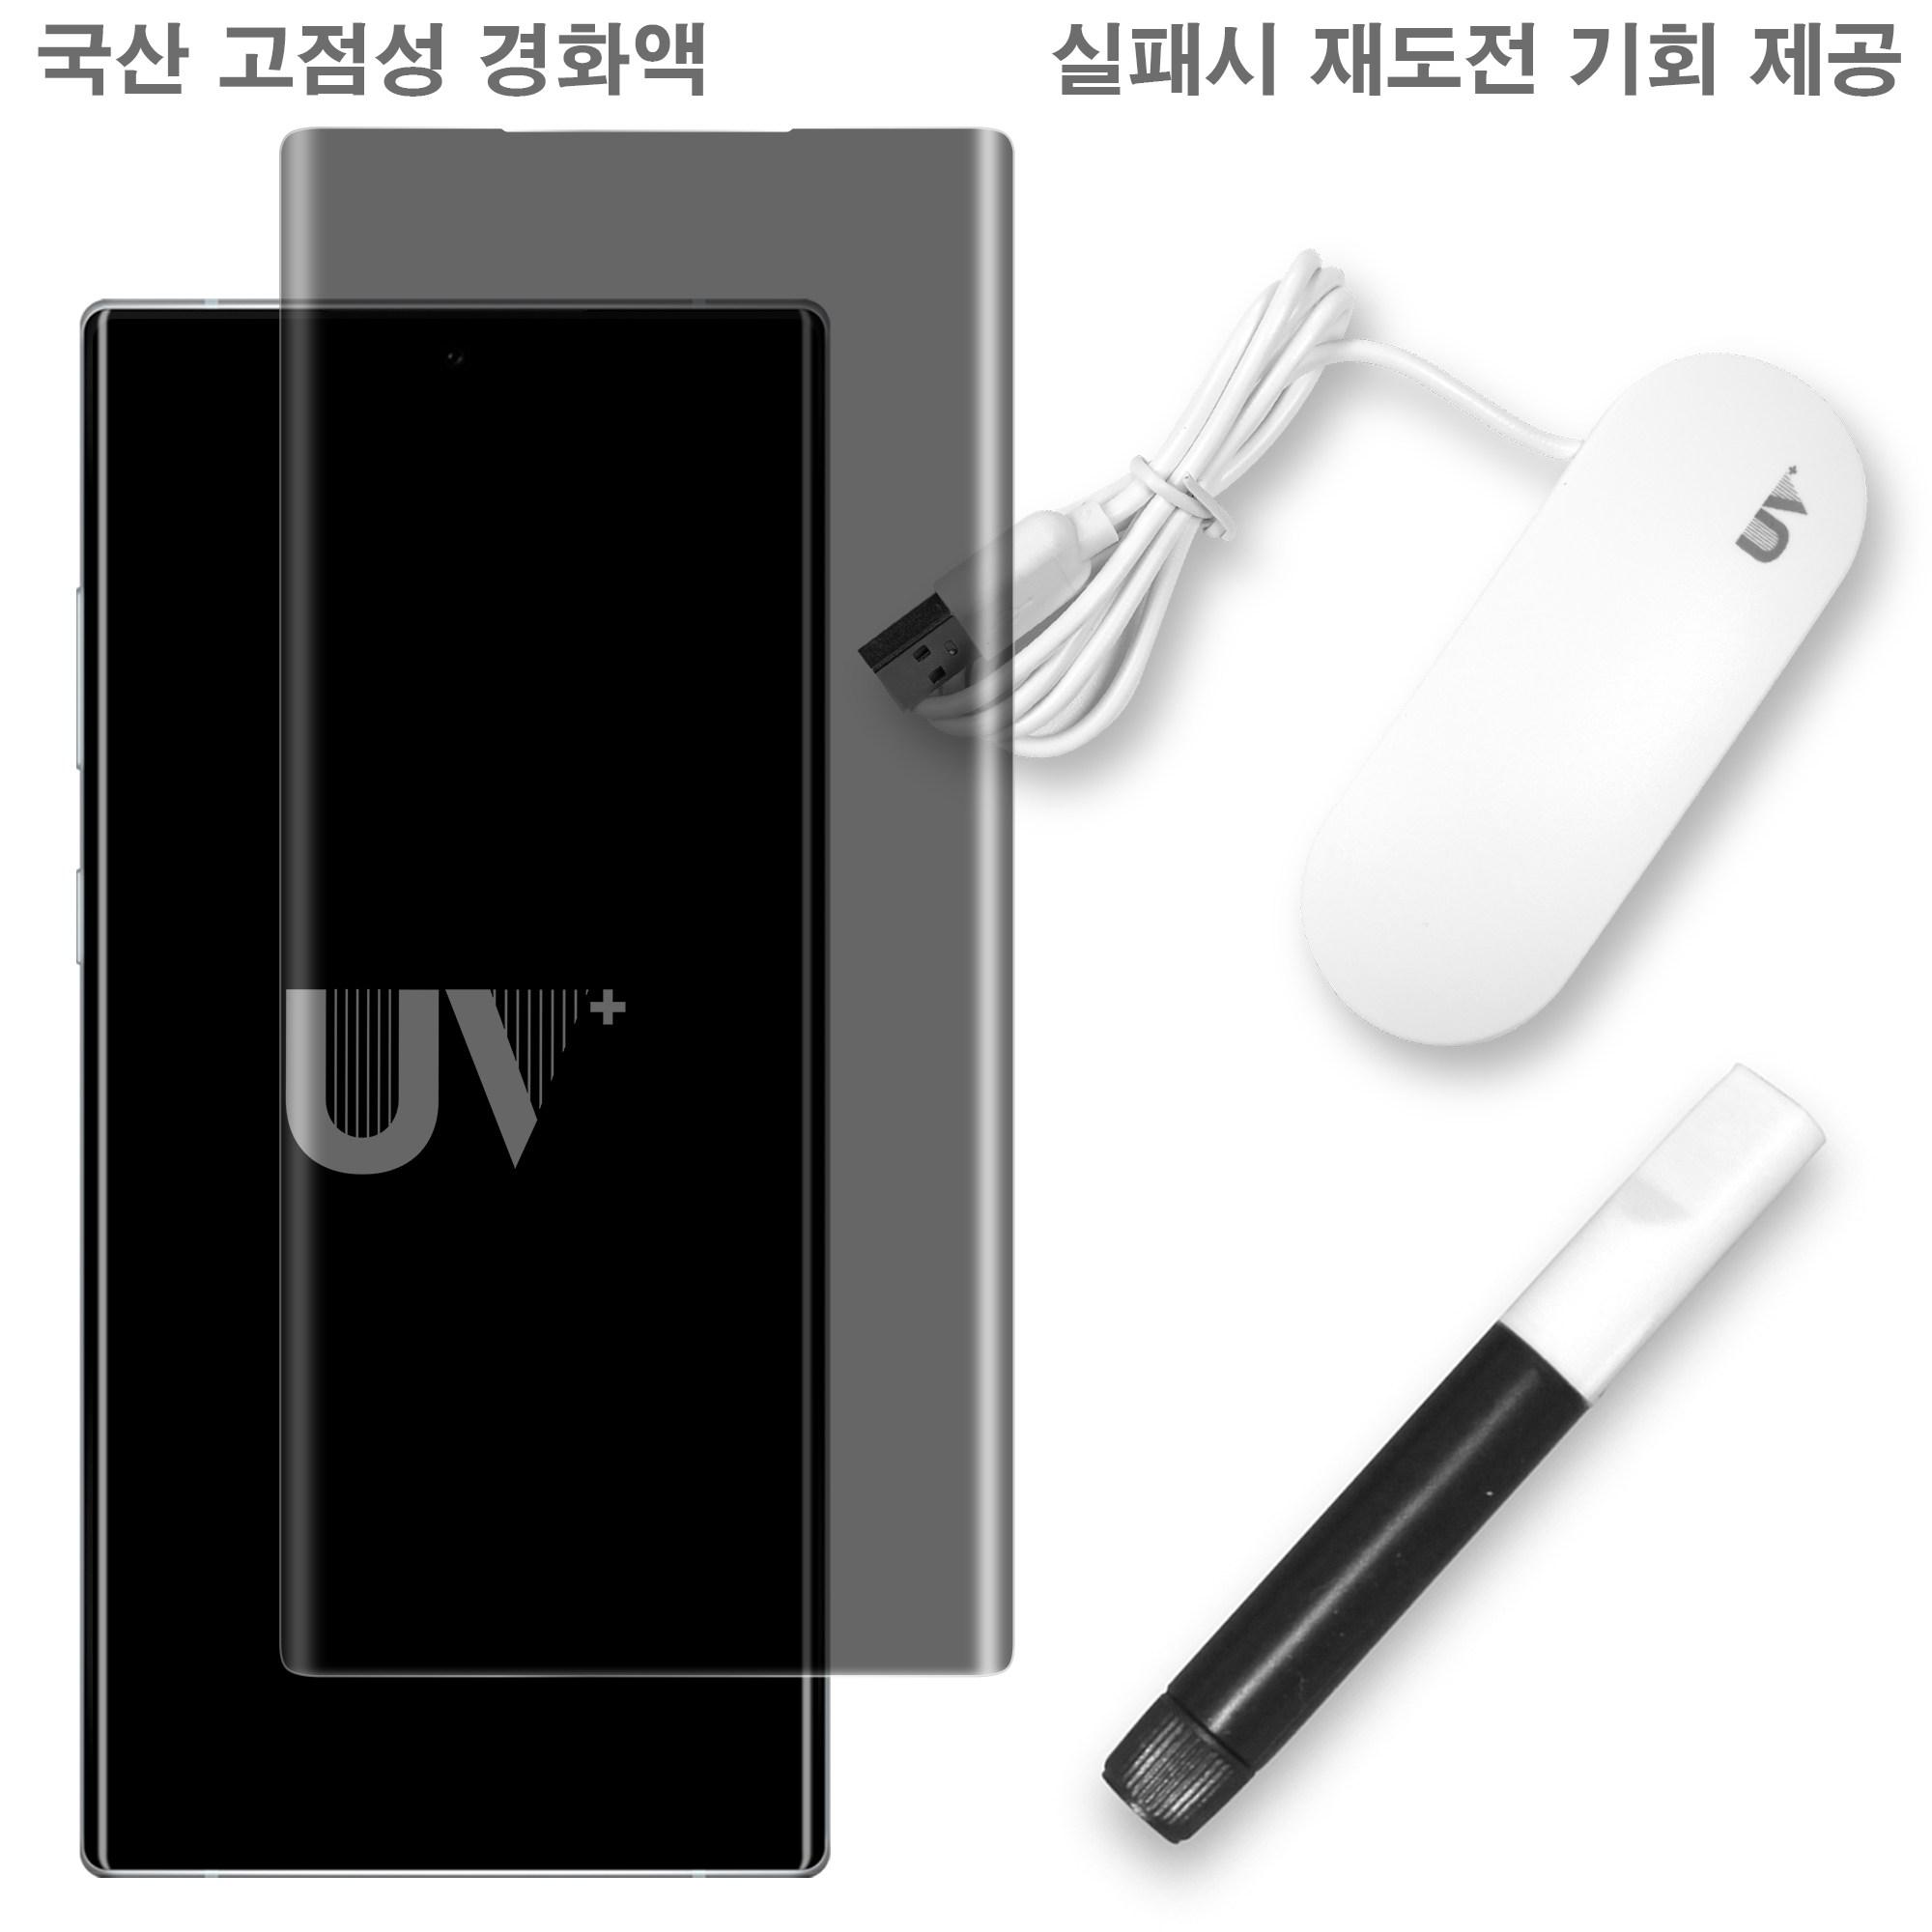 UV플러스 사생활 연고강화유리 UV 고점성 풀점착 풀커버 갤럭시 아이폰 10기종, 1세트